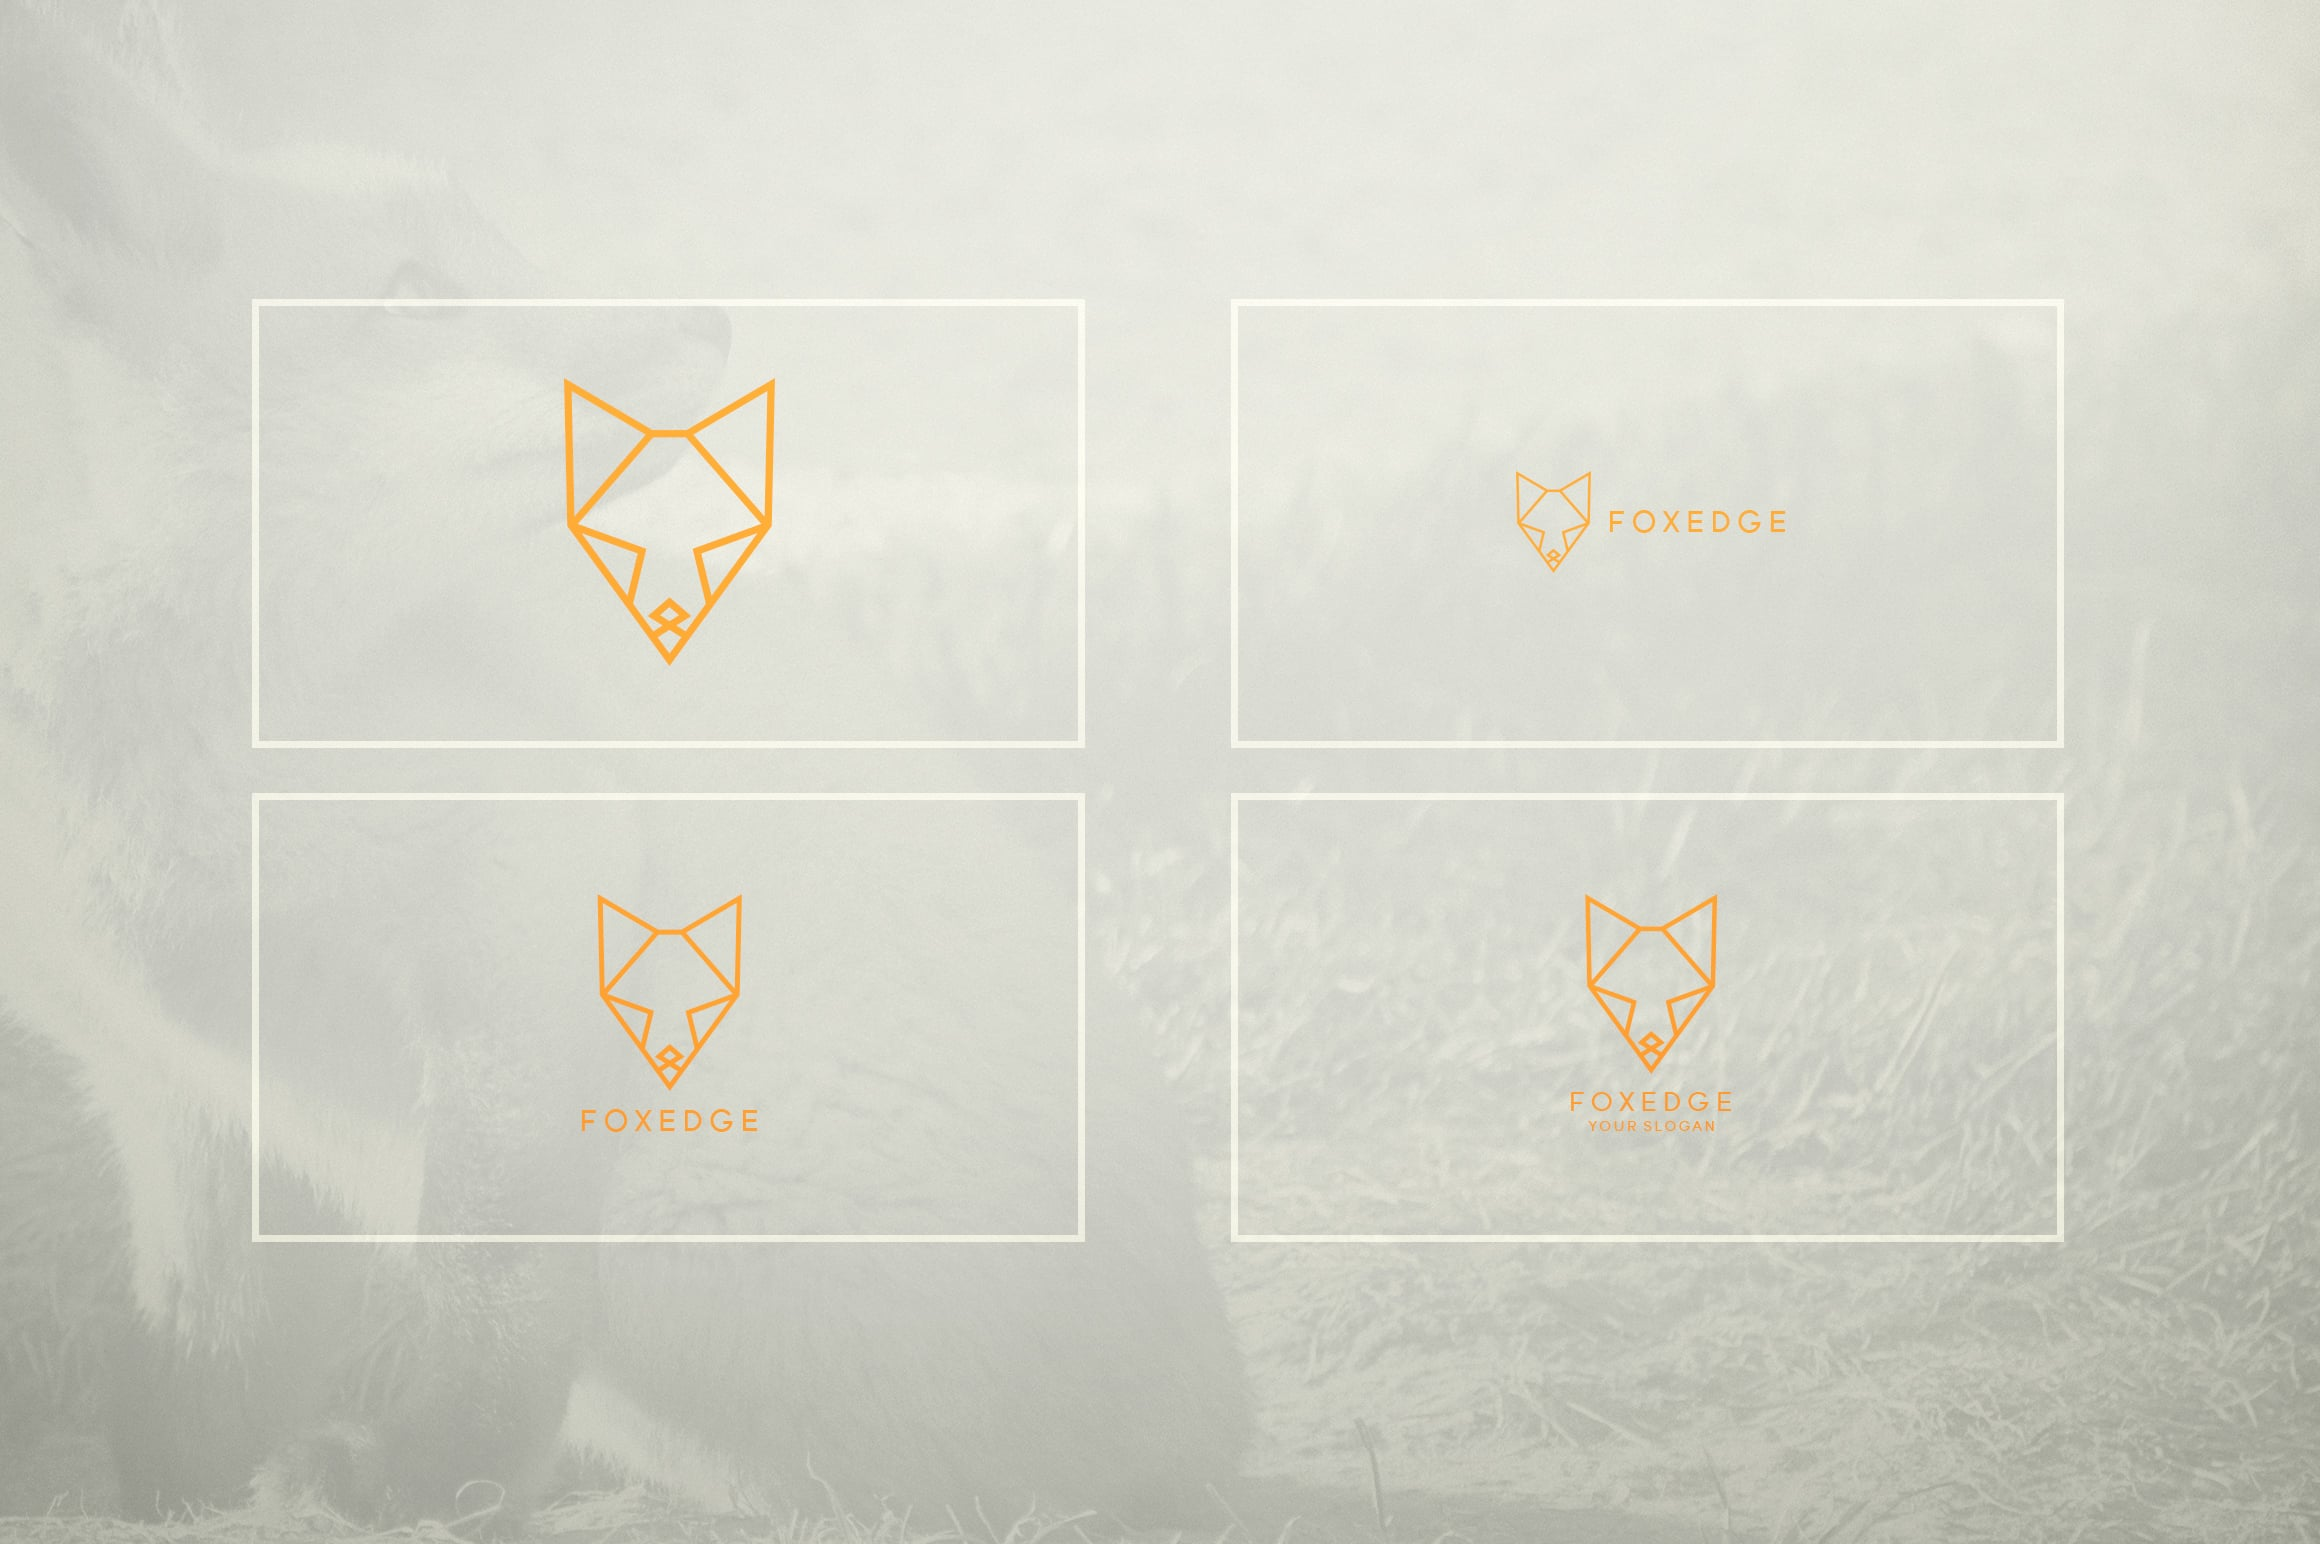 17 Geometric Animal Icons and Logos - 16